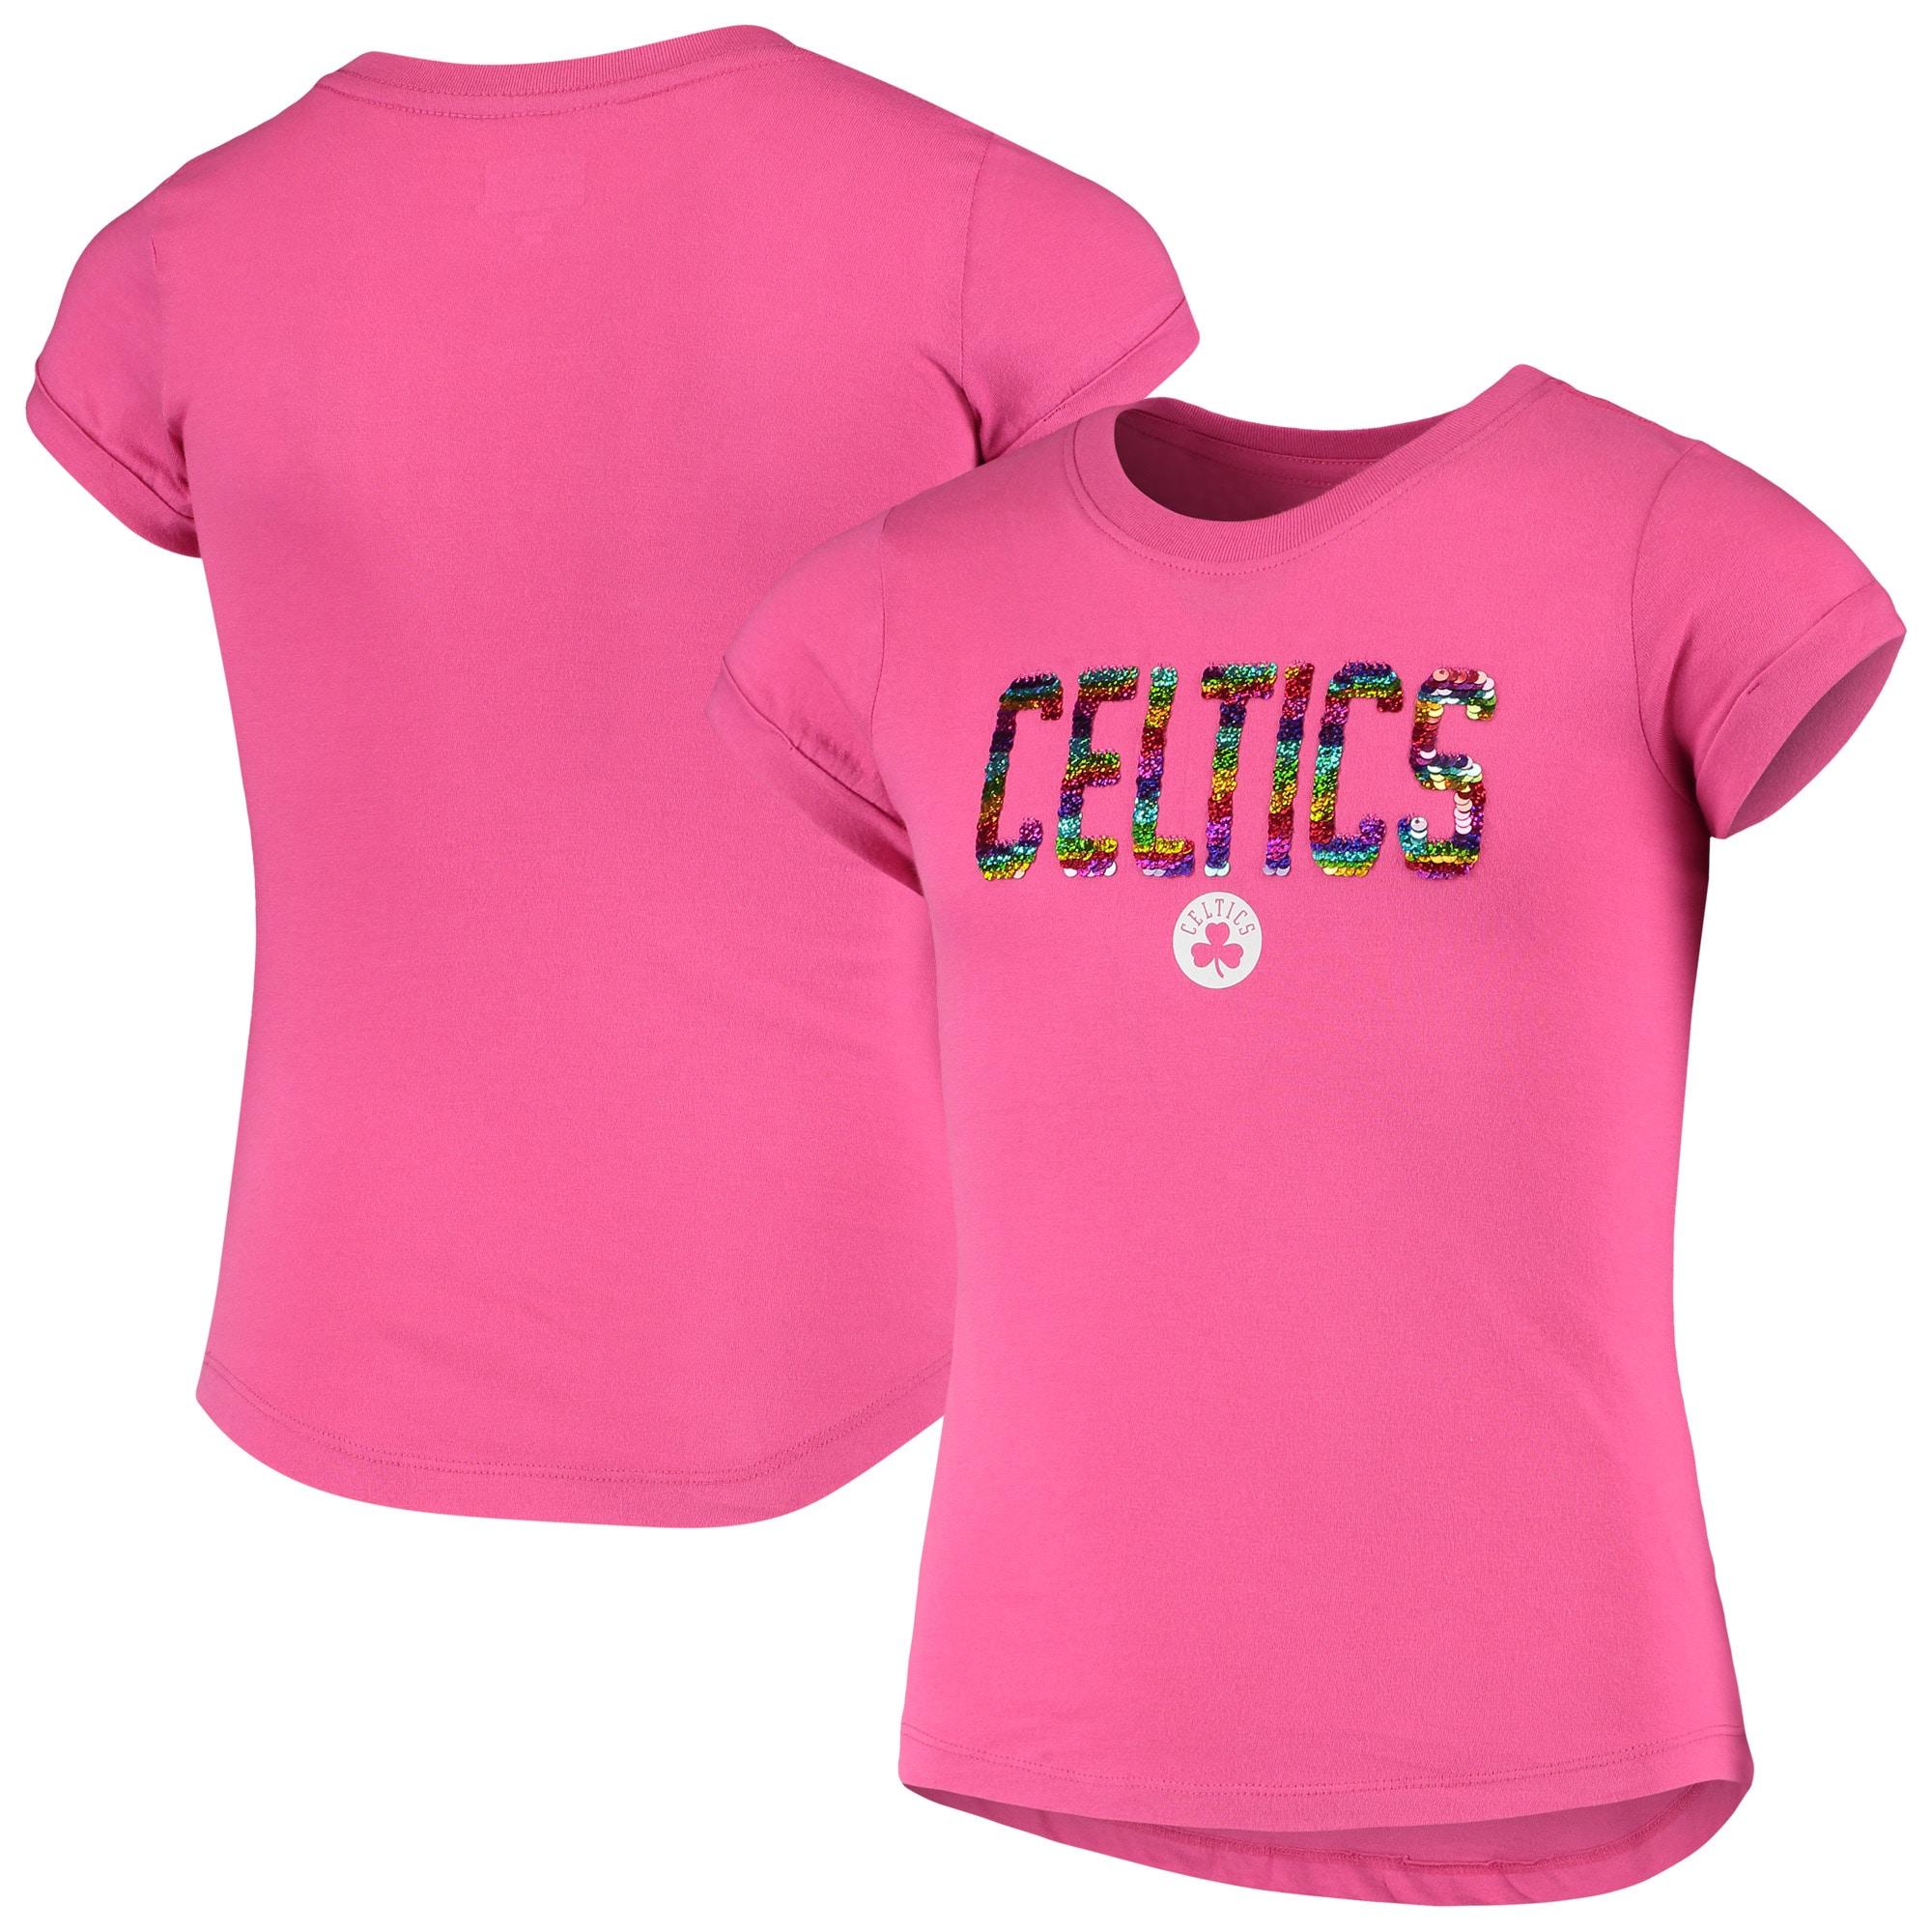 Boston Celtics New Era Girls Youth Sequin Logo Baby Jersey T-Shirt - Pink